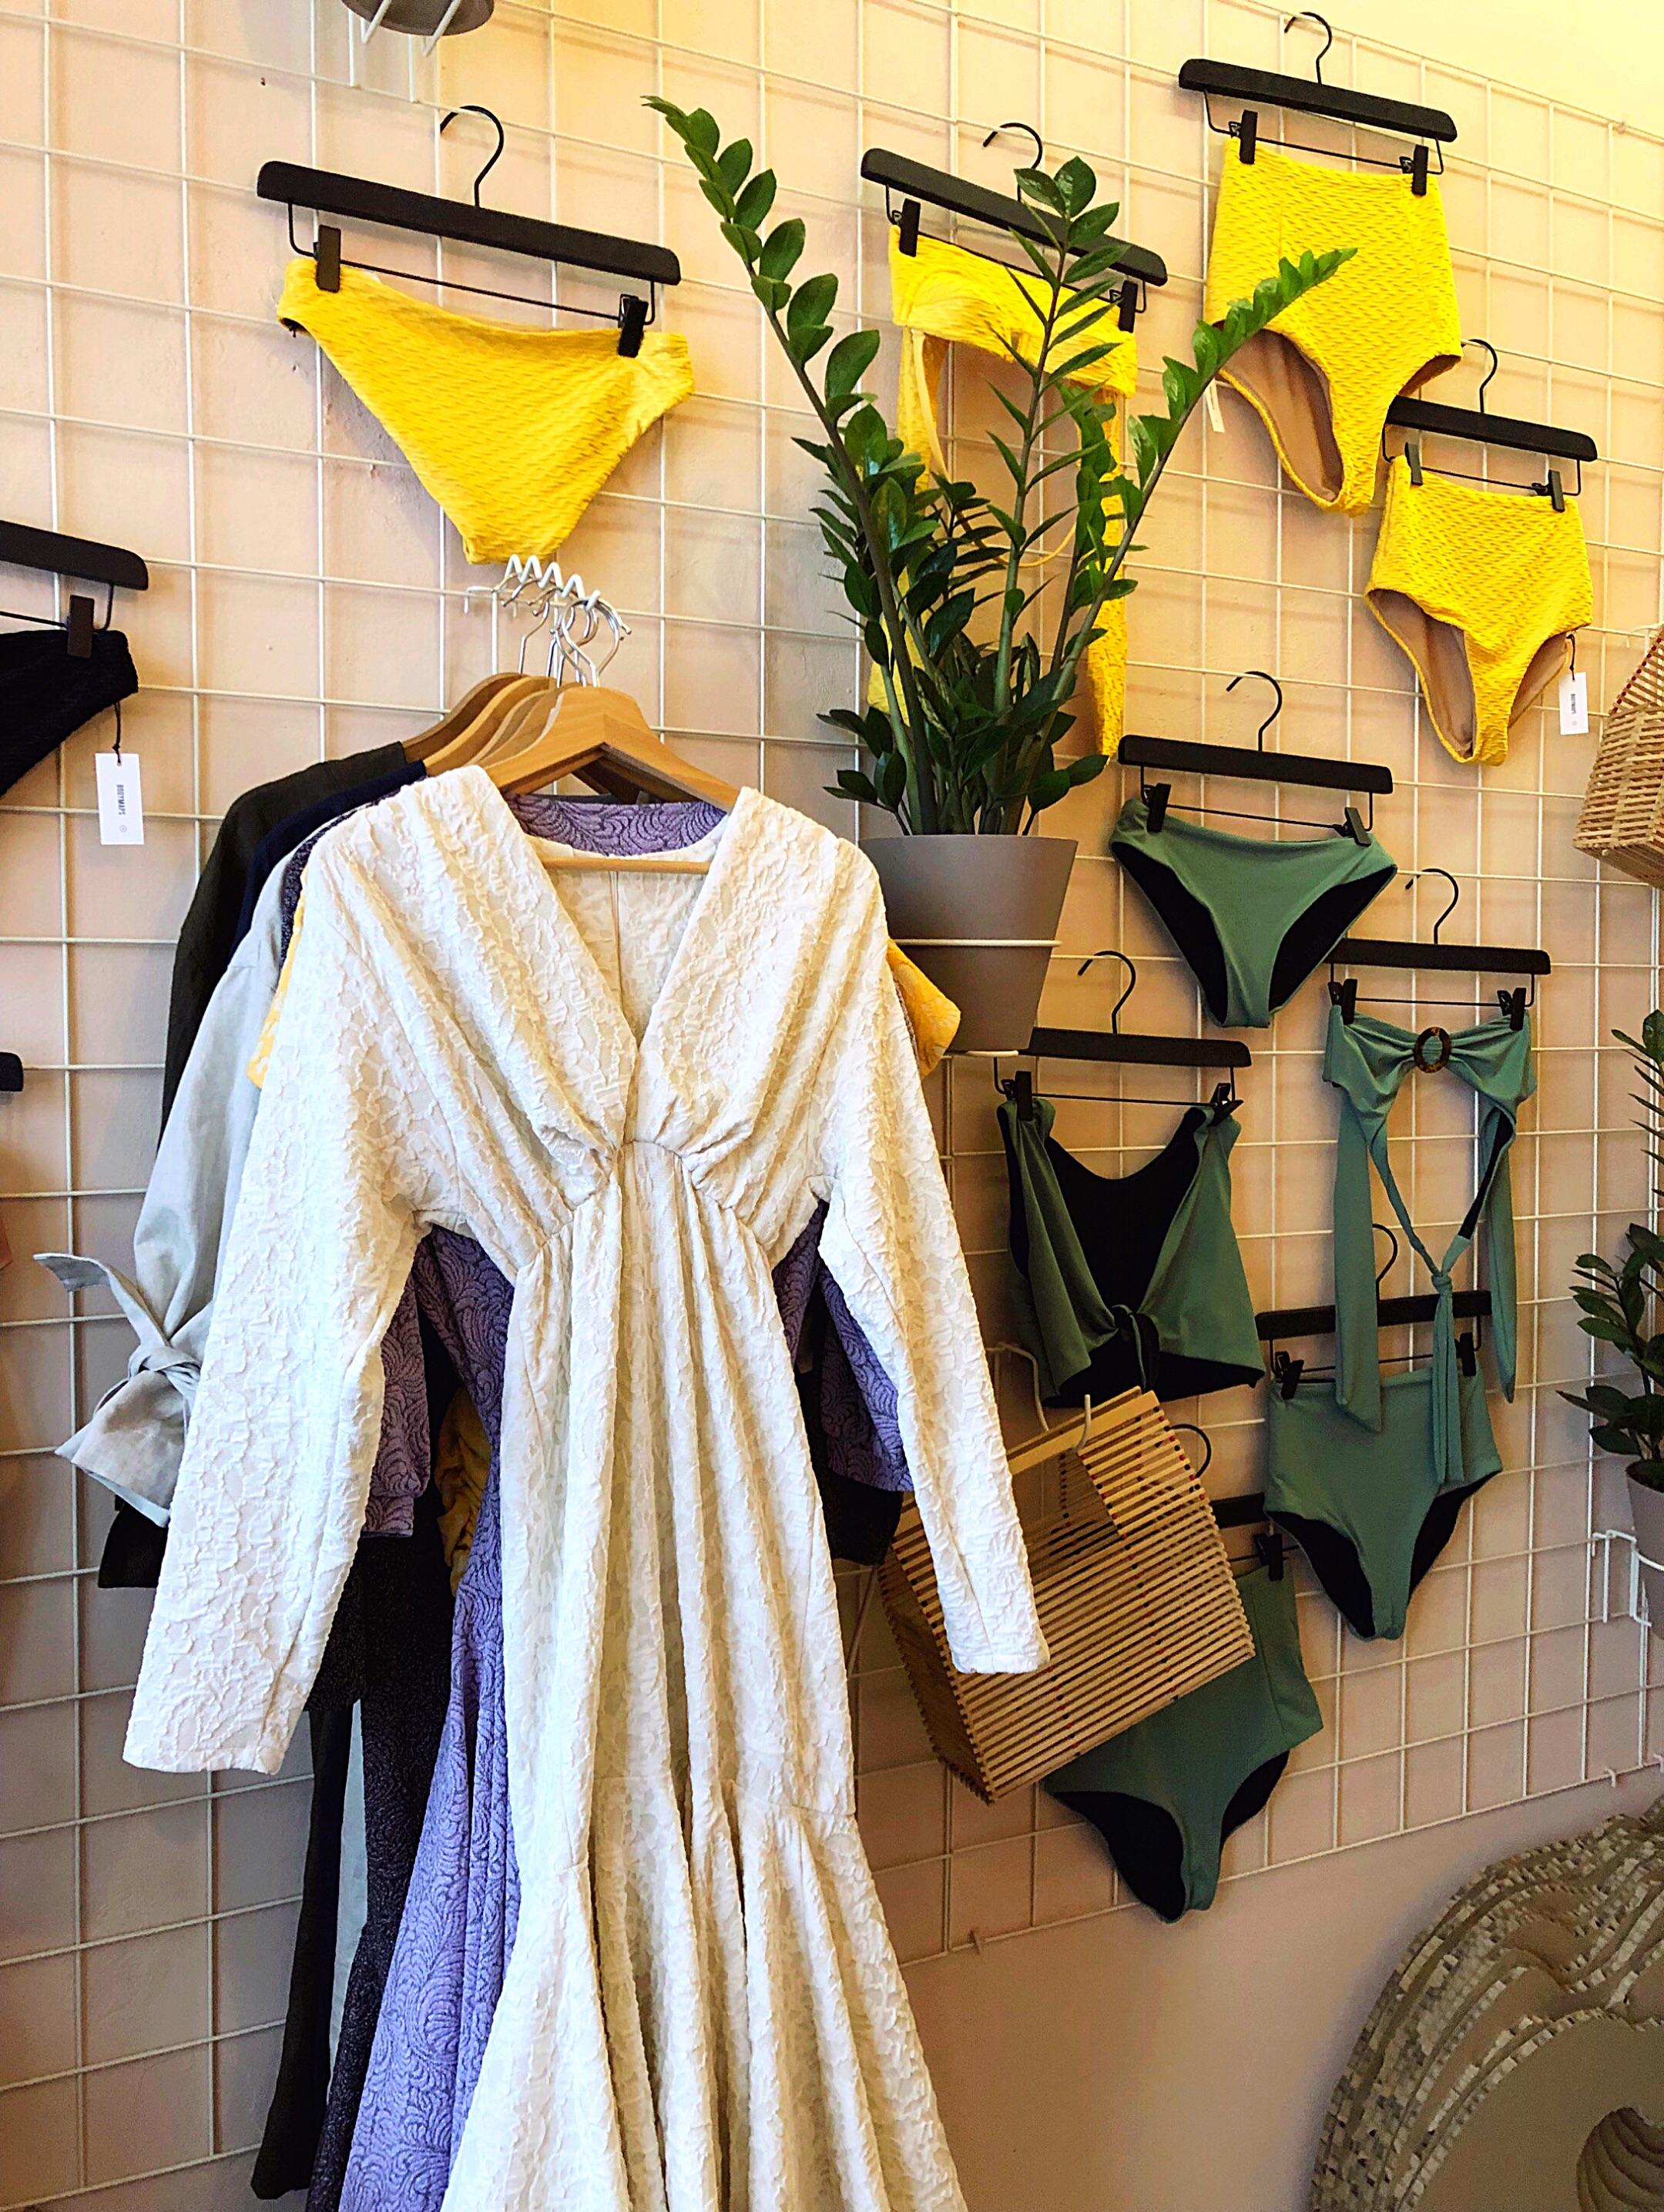 Inside Bodymaps boutique